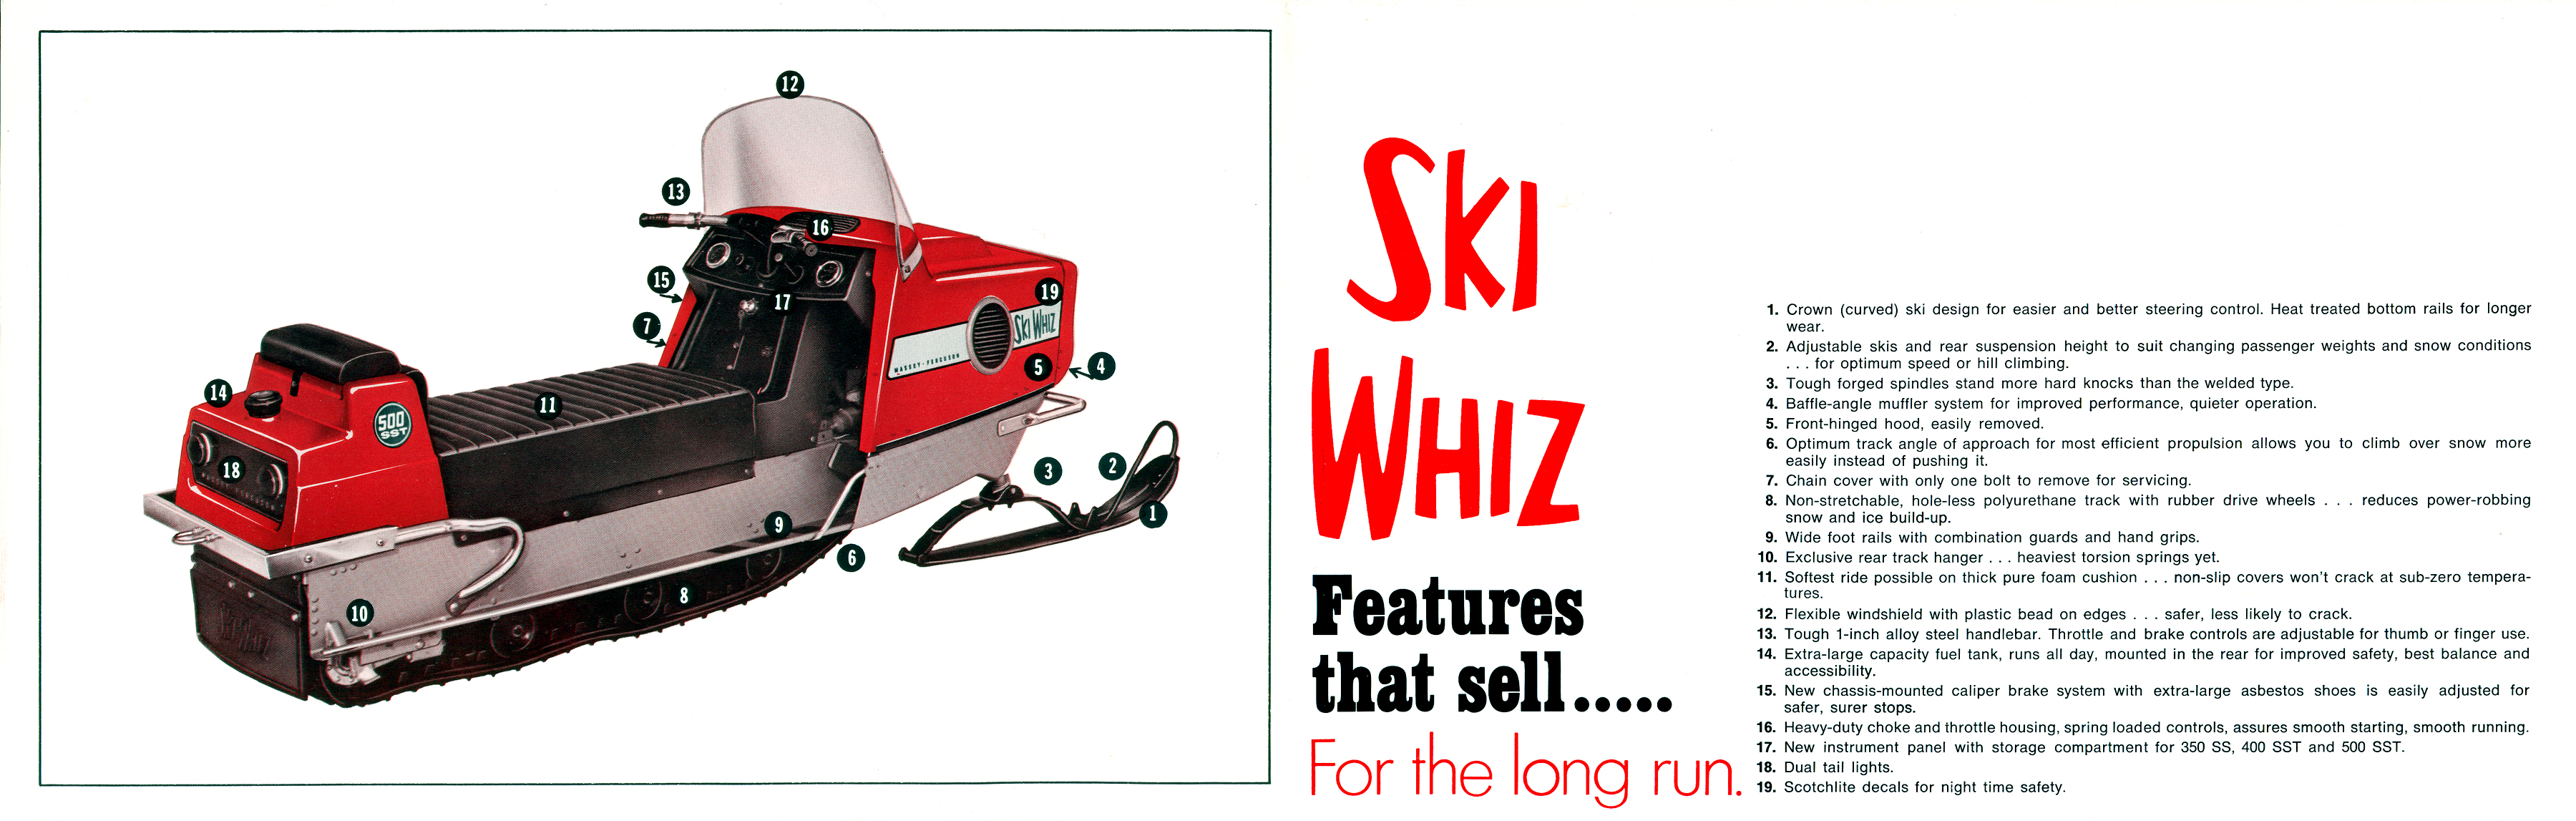 Ski whiz snowmobiles for sale - 1971 Massey Ferguson Ski Whiz Snowmobile Brochure